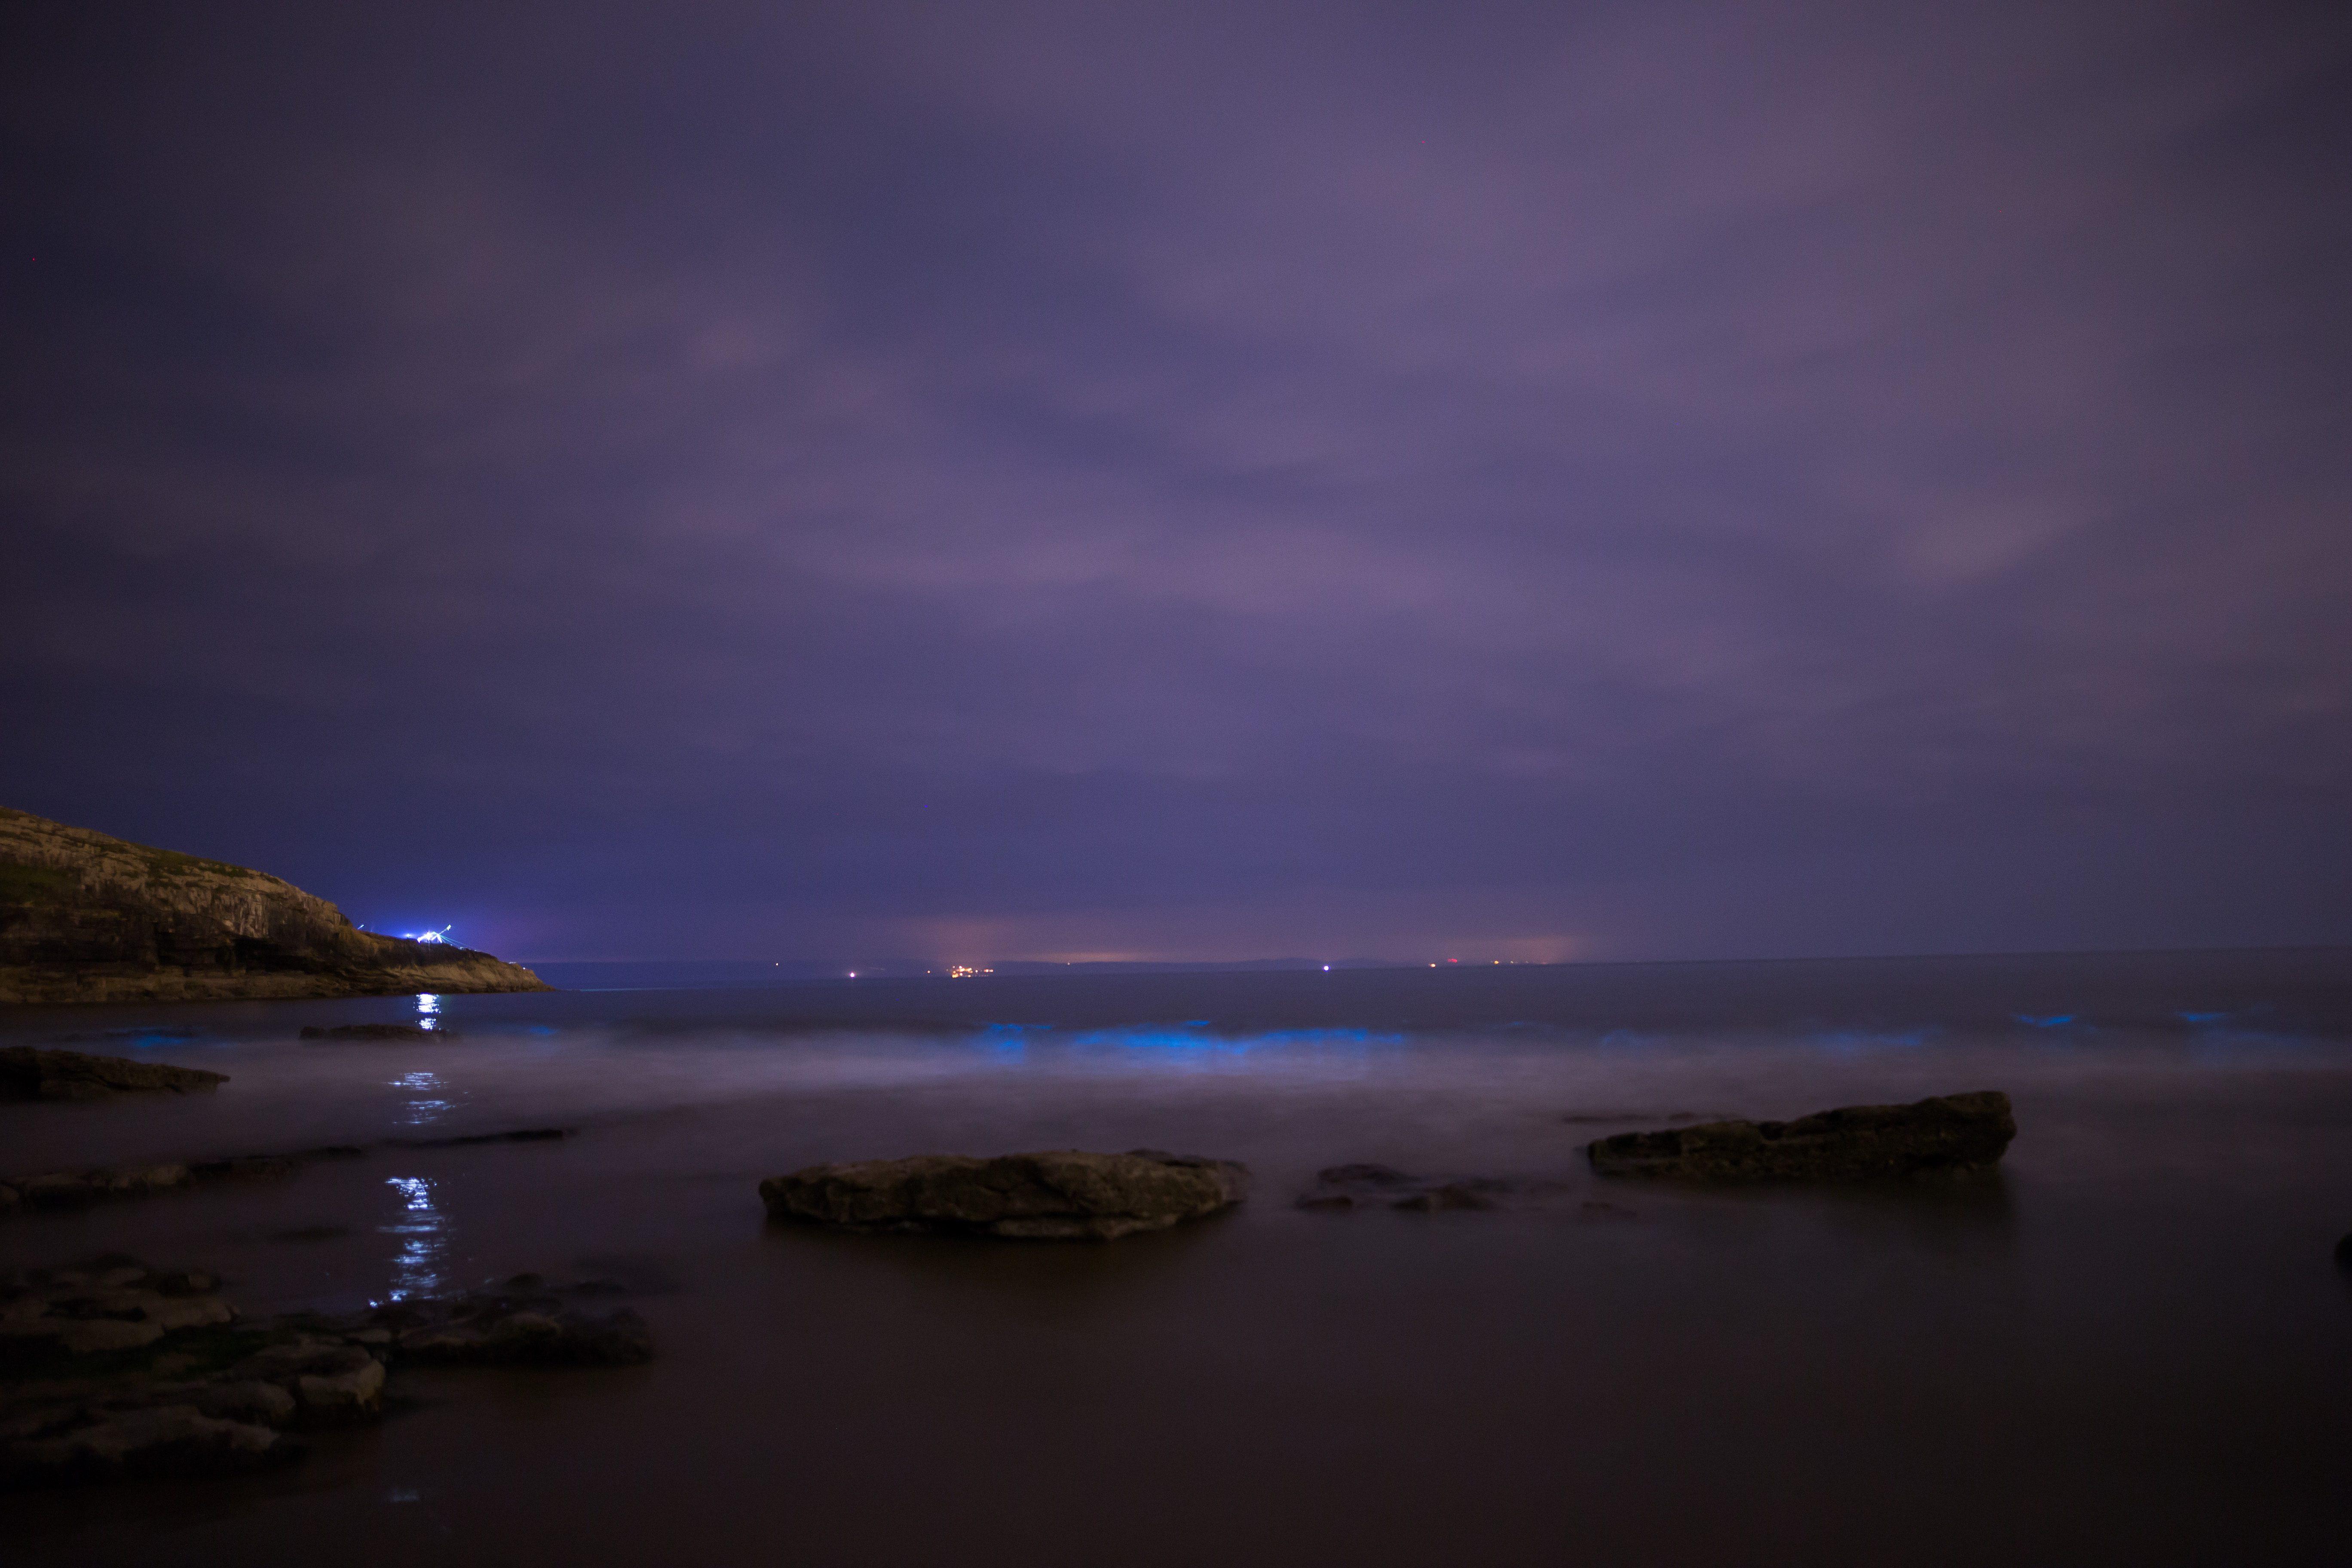 Bioluminescent Plankton South Wales 2019